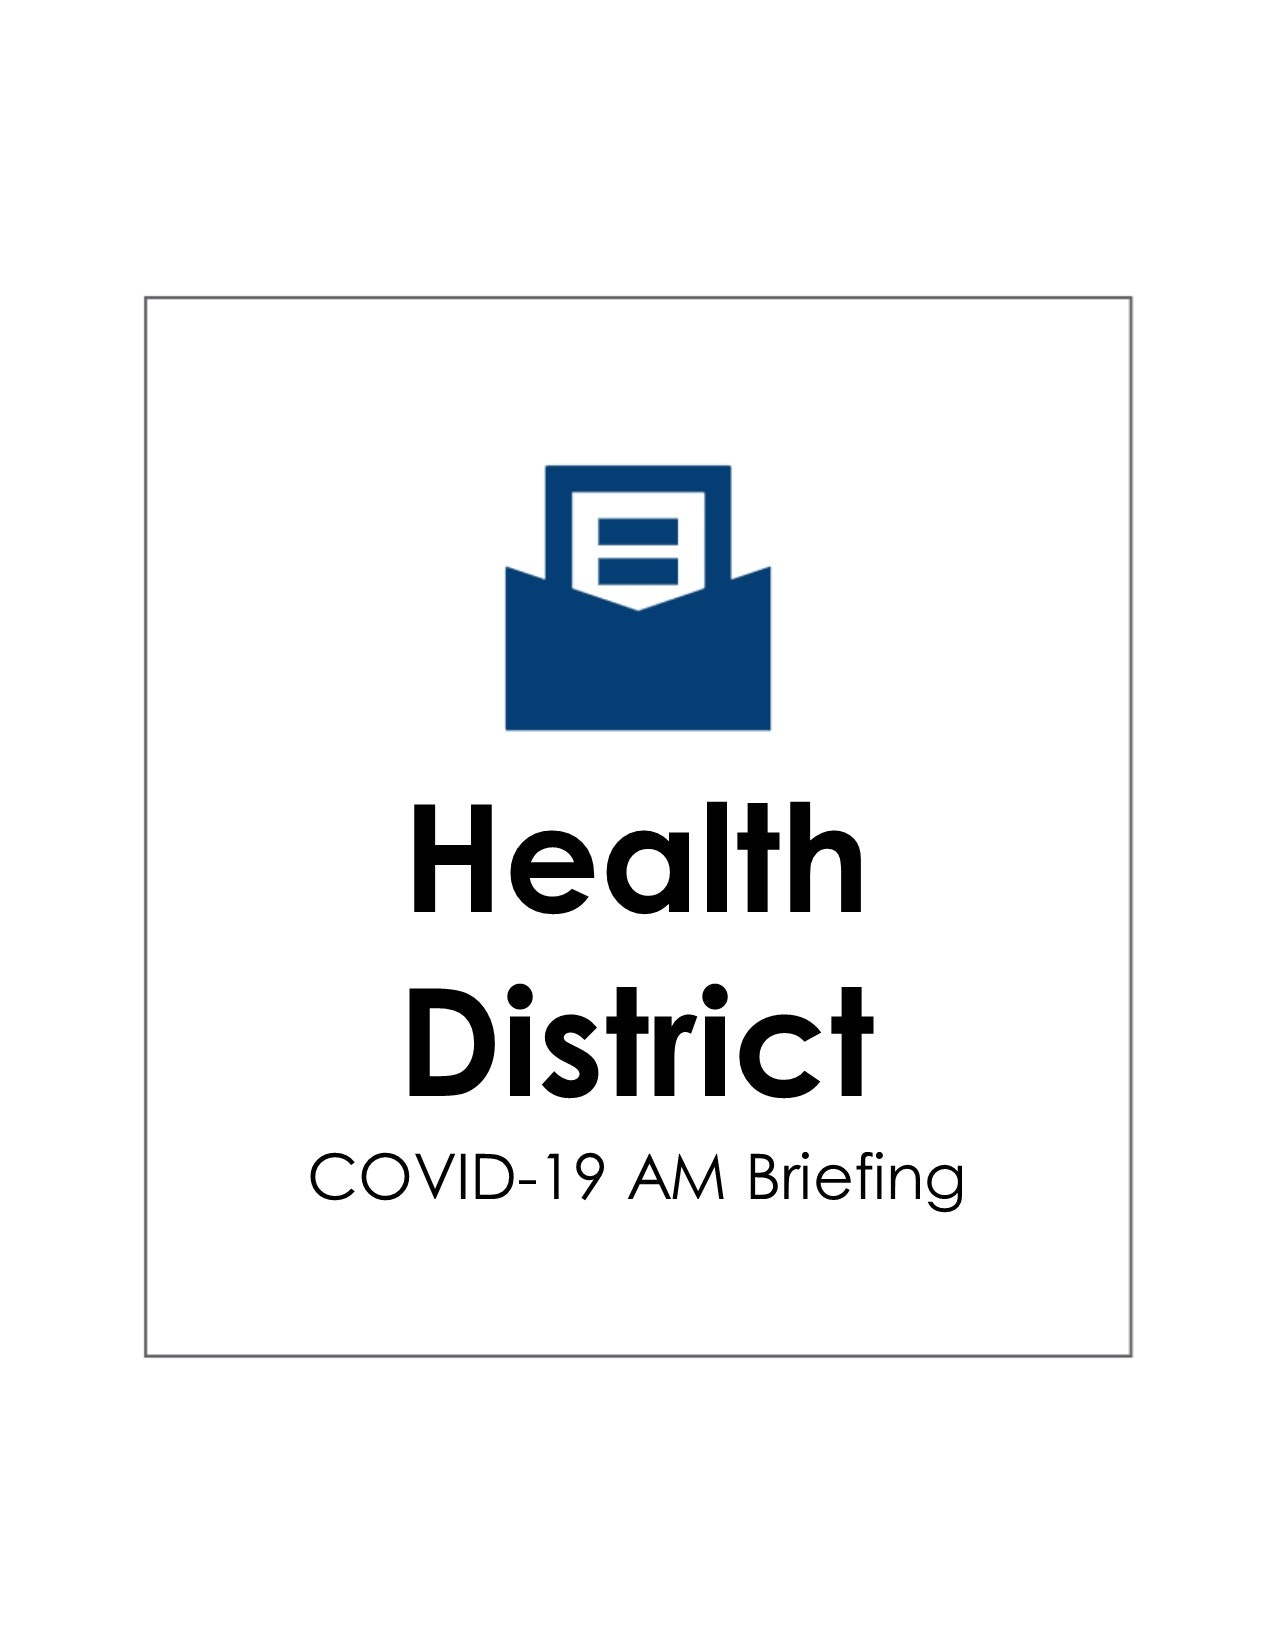 Health District COVID-19 AM Briefing